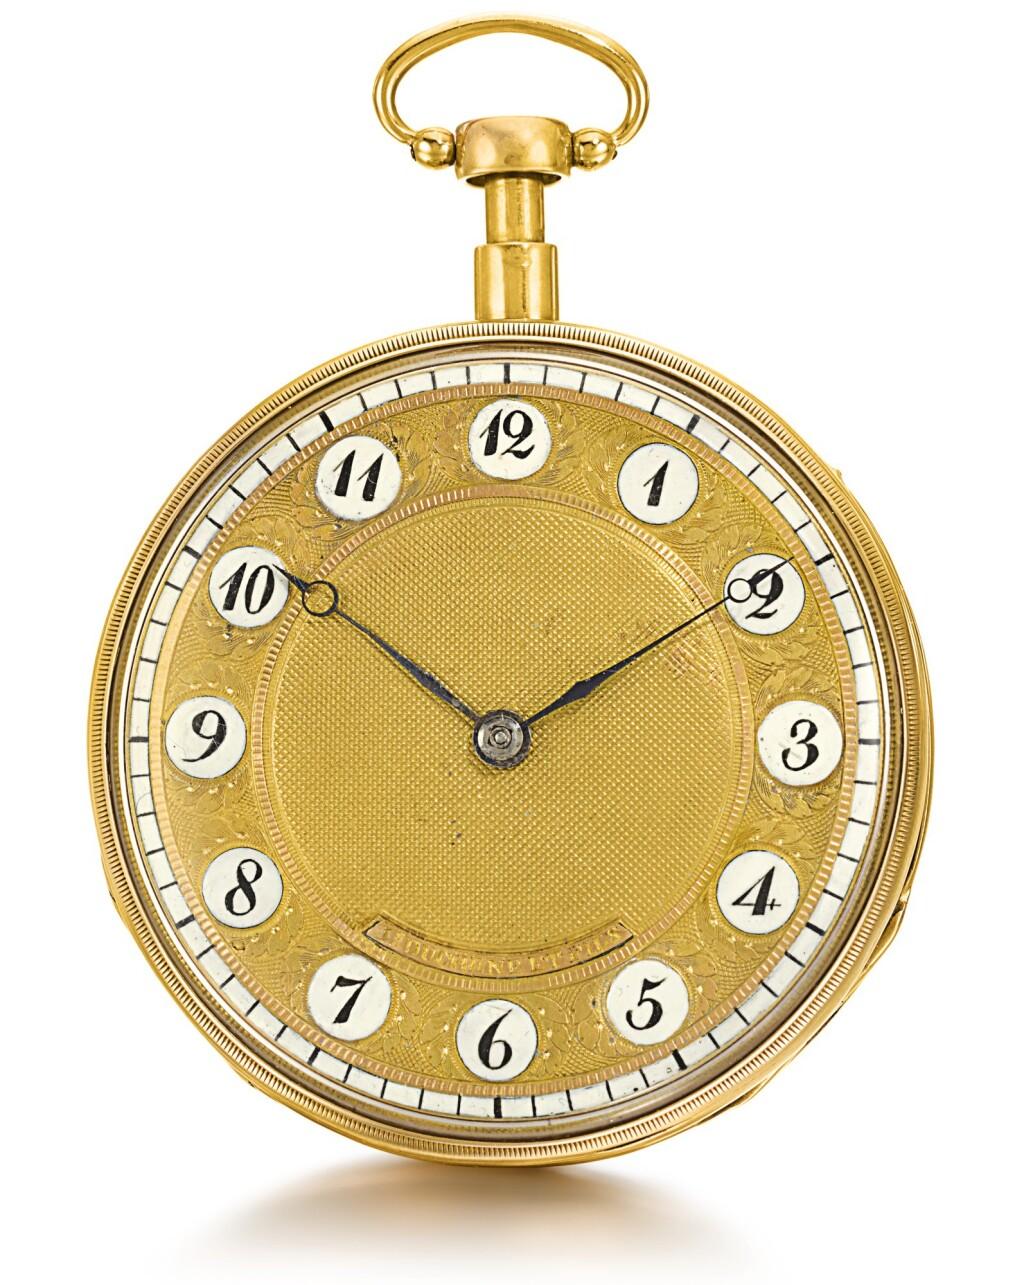 LS. DUCHÈNE ET FILS | A GOLD QUARTER REPEATING KEY WOUND MUSICAL WATCH   CIRCA 1820, NO. 94473